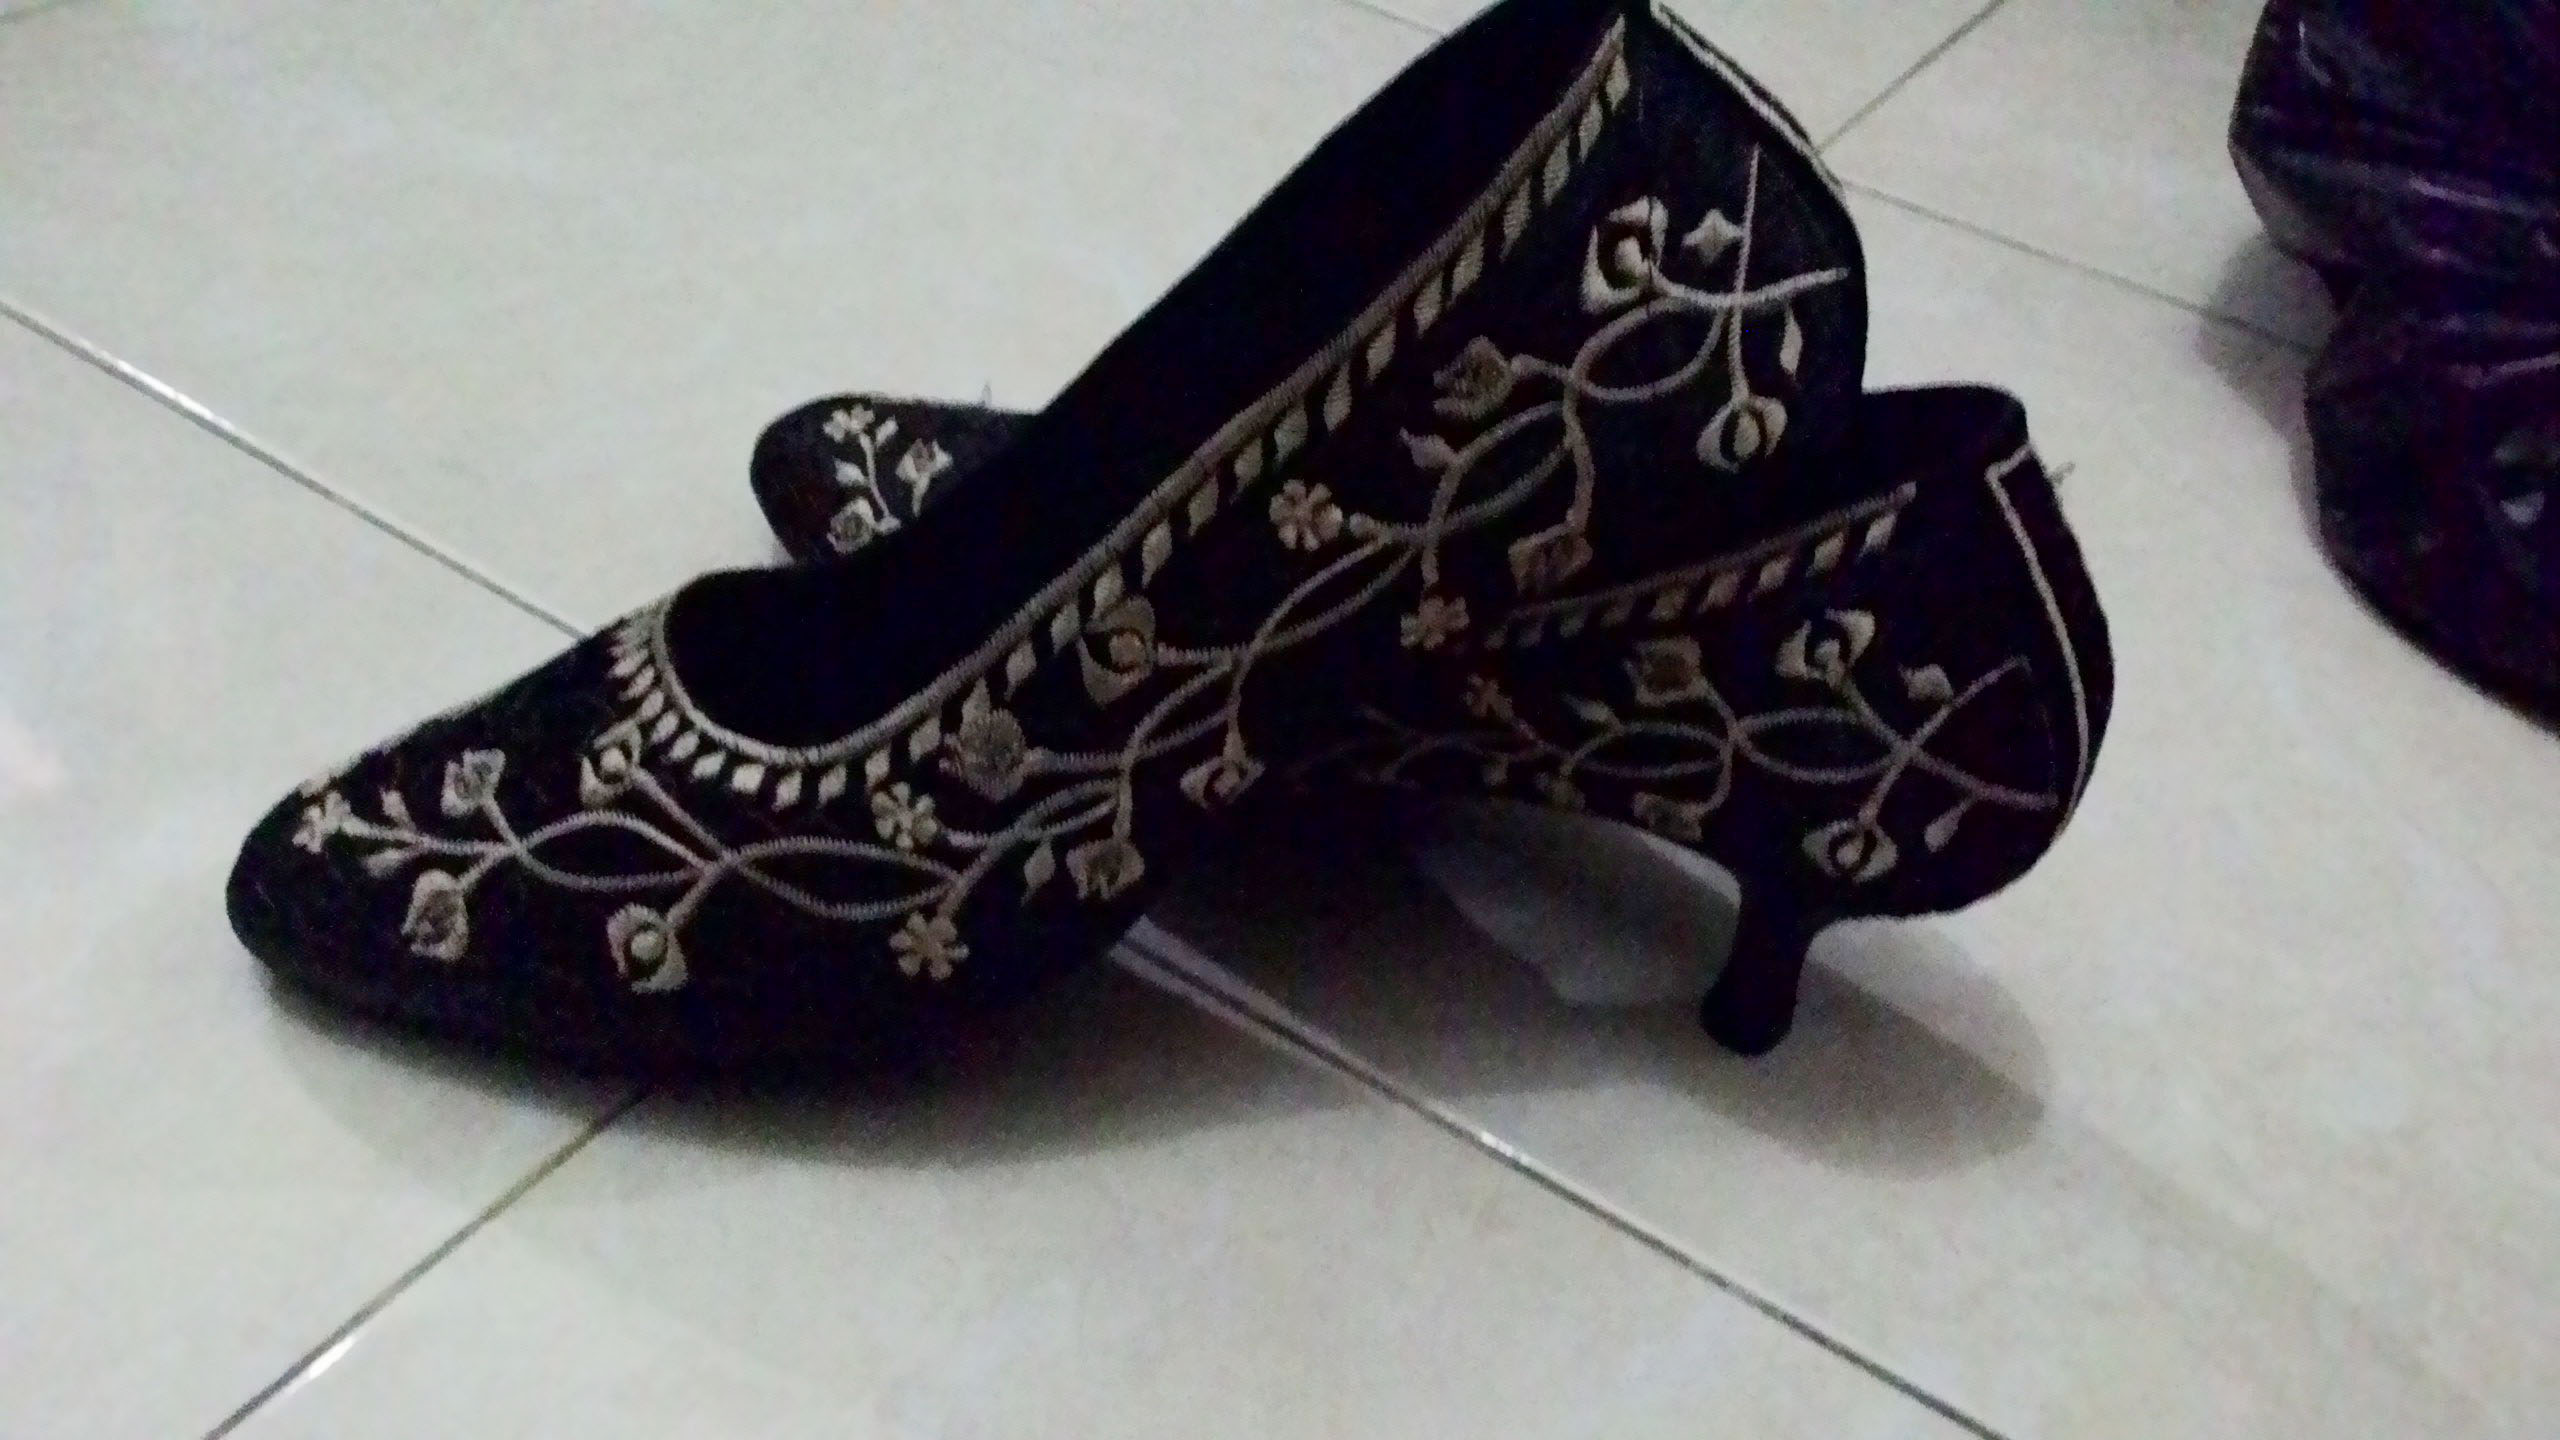 Jual Sepatu Bordir Bunga Rambat, Sepatu Bordir Bangil Murah